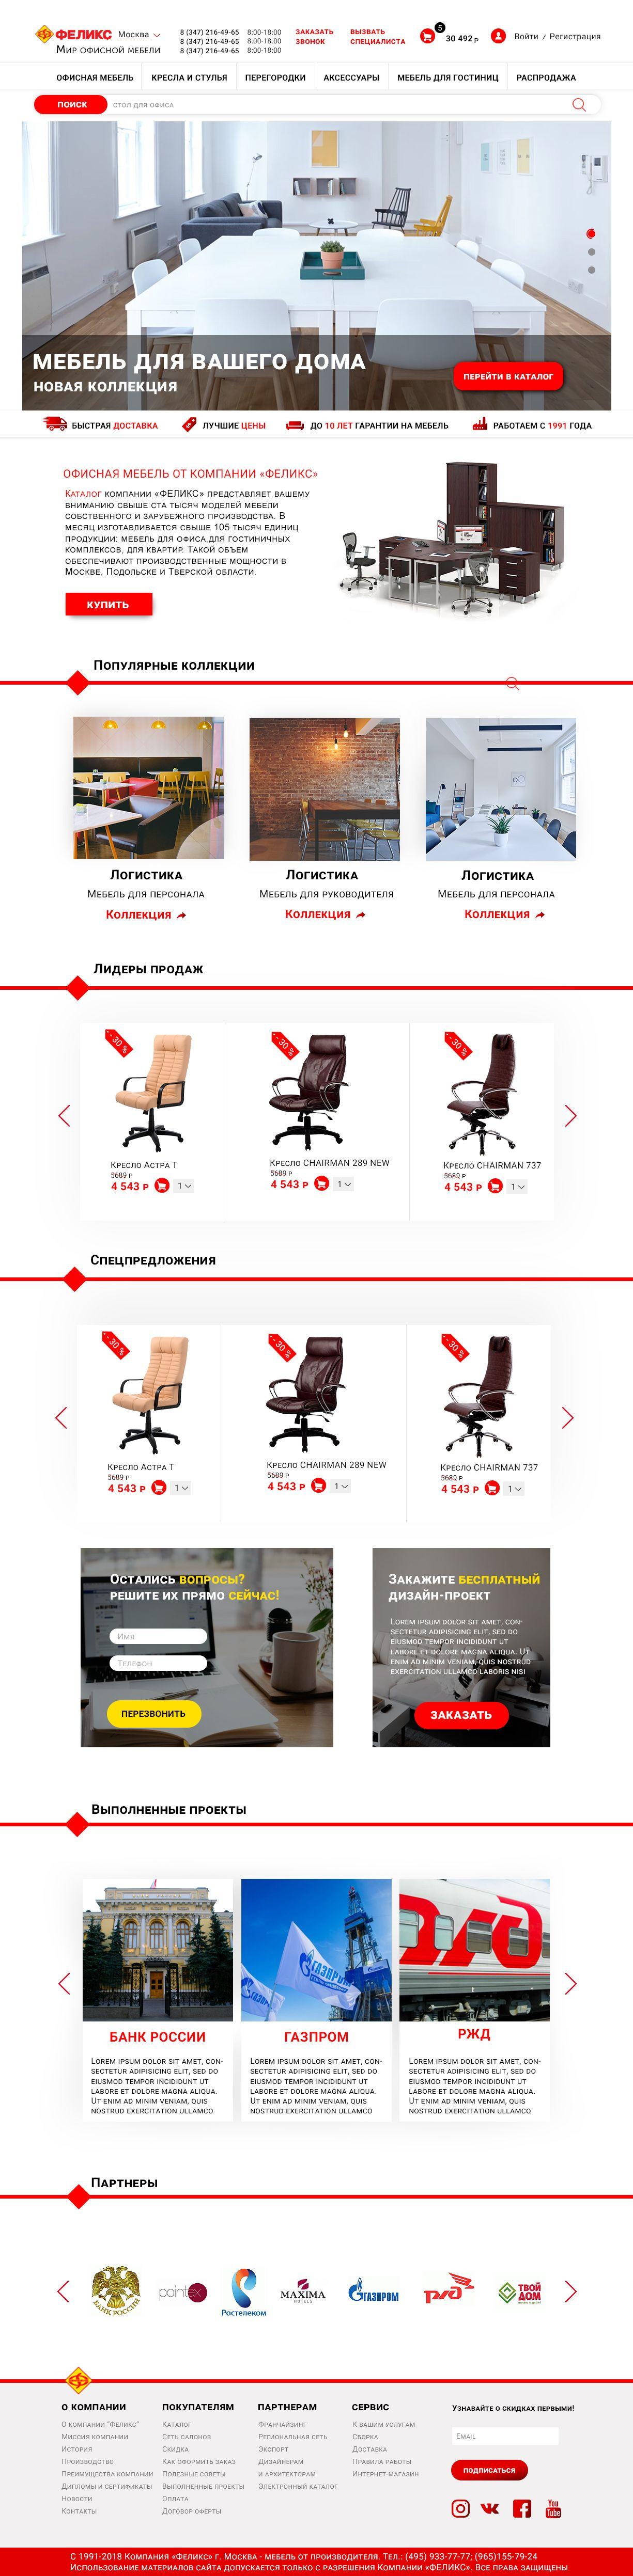 Веб-сайт для https://www.felix.ru - дизайнер Sleepless